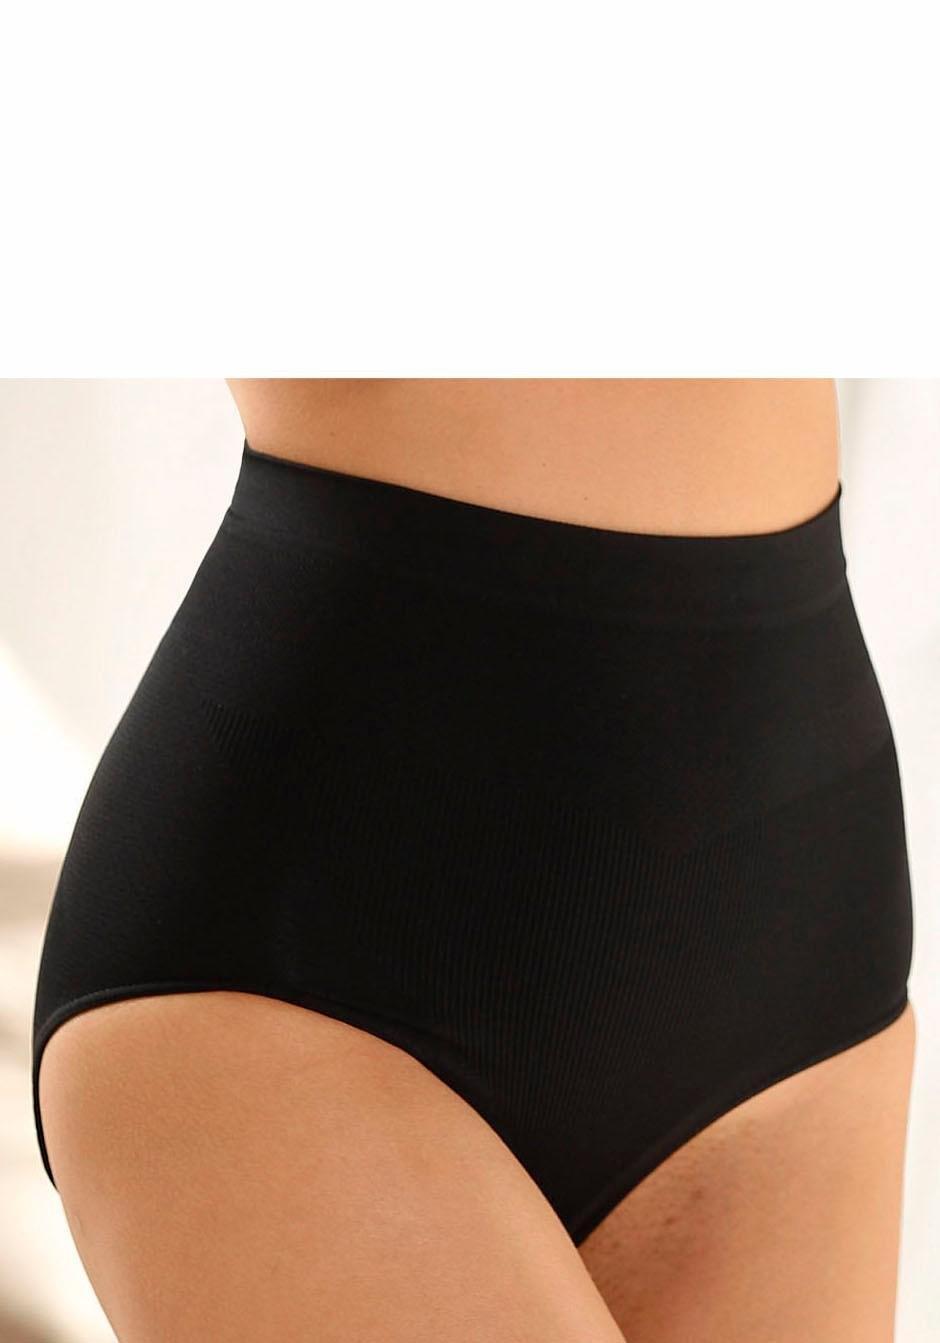 Nuance comfortabele taille-shaper-slip goedkoop op lascana.nl kopen